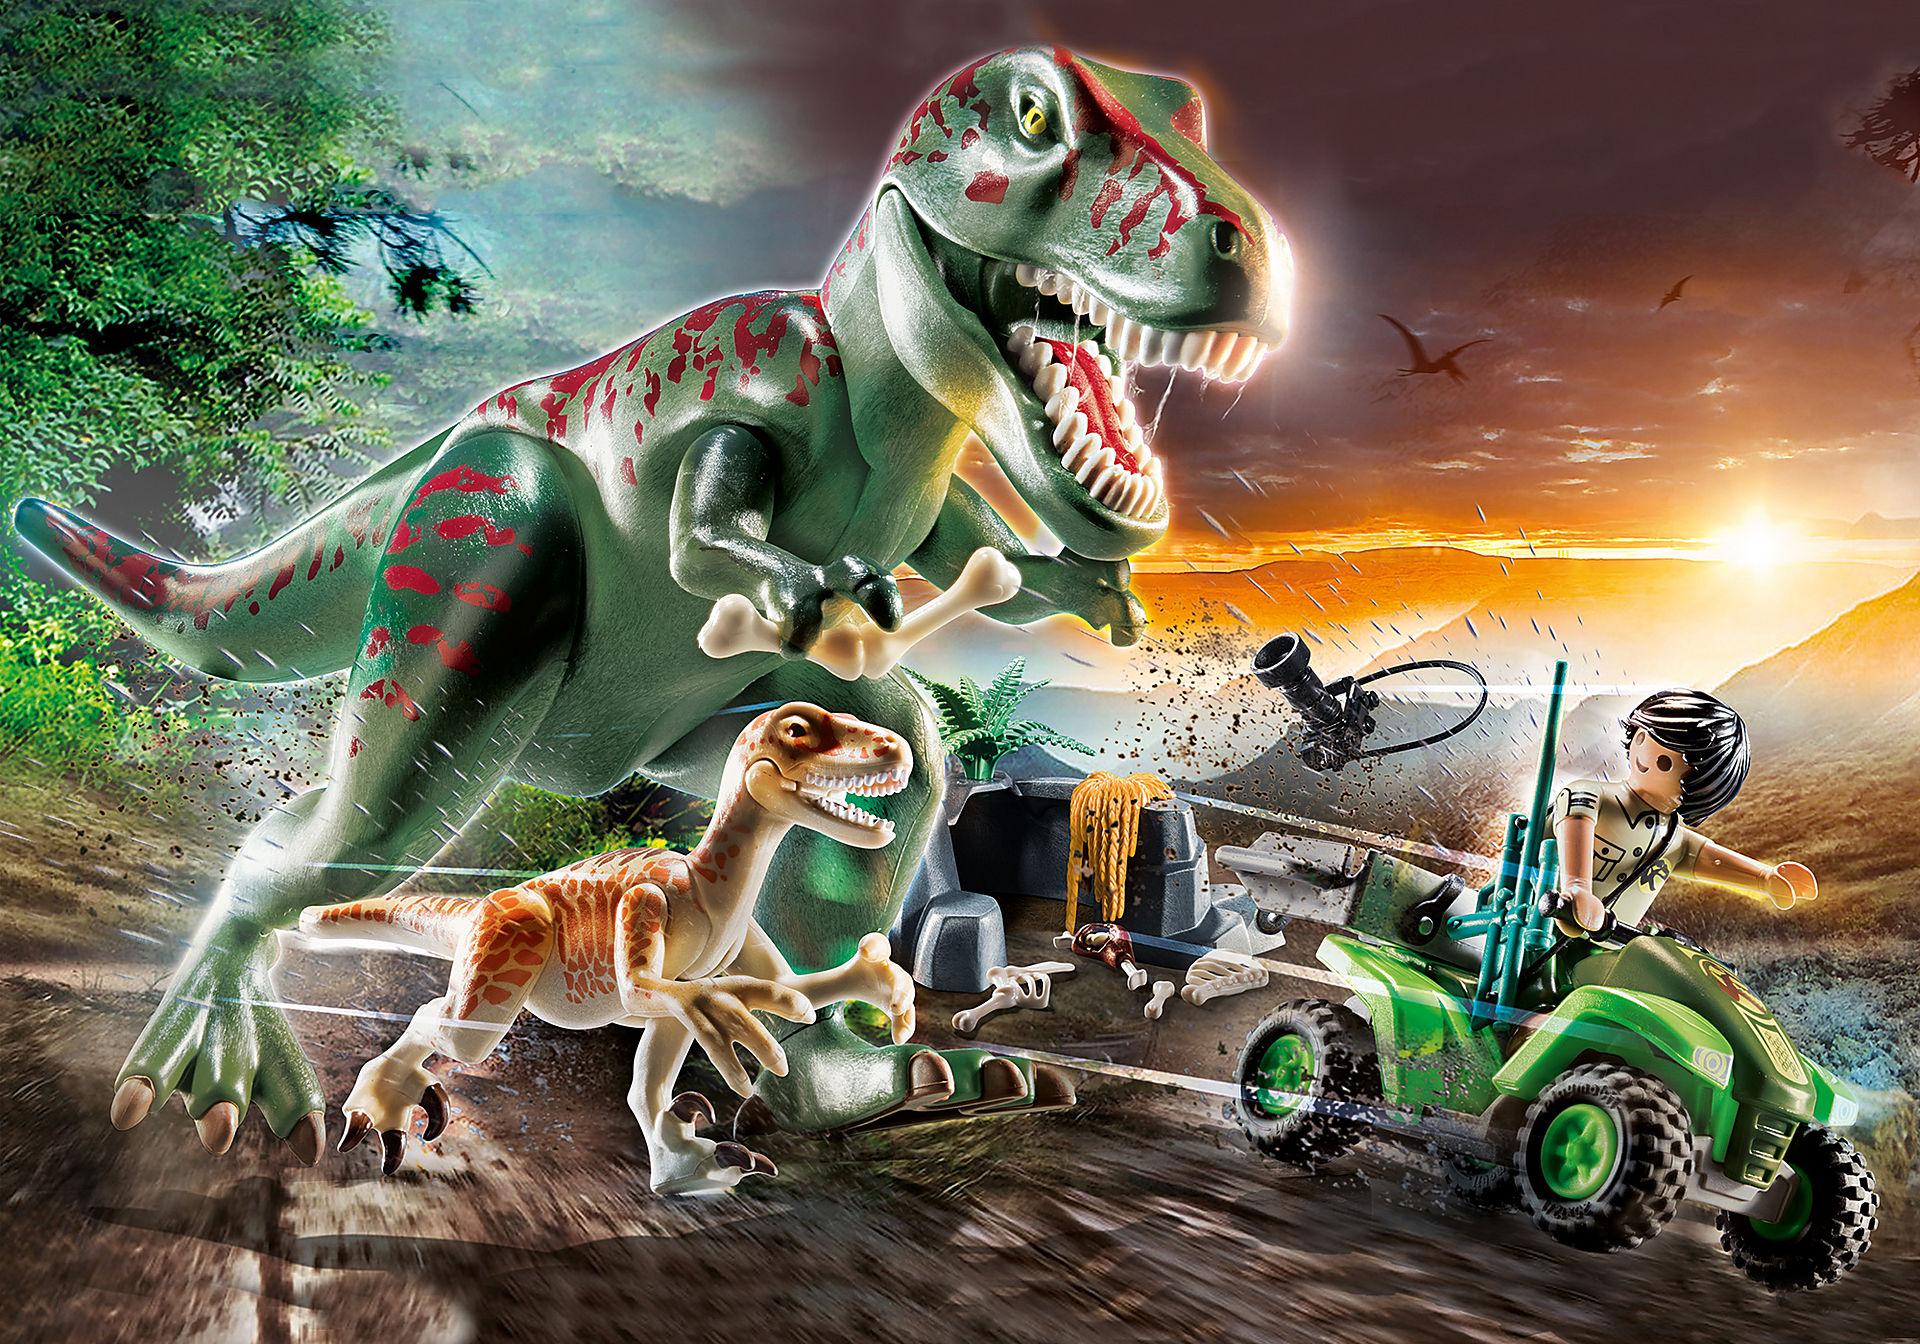 70632 Ataque del T-Rex zoom image1